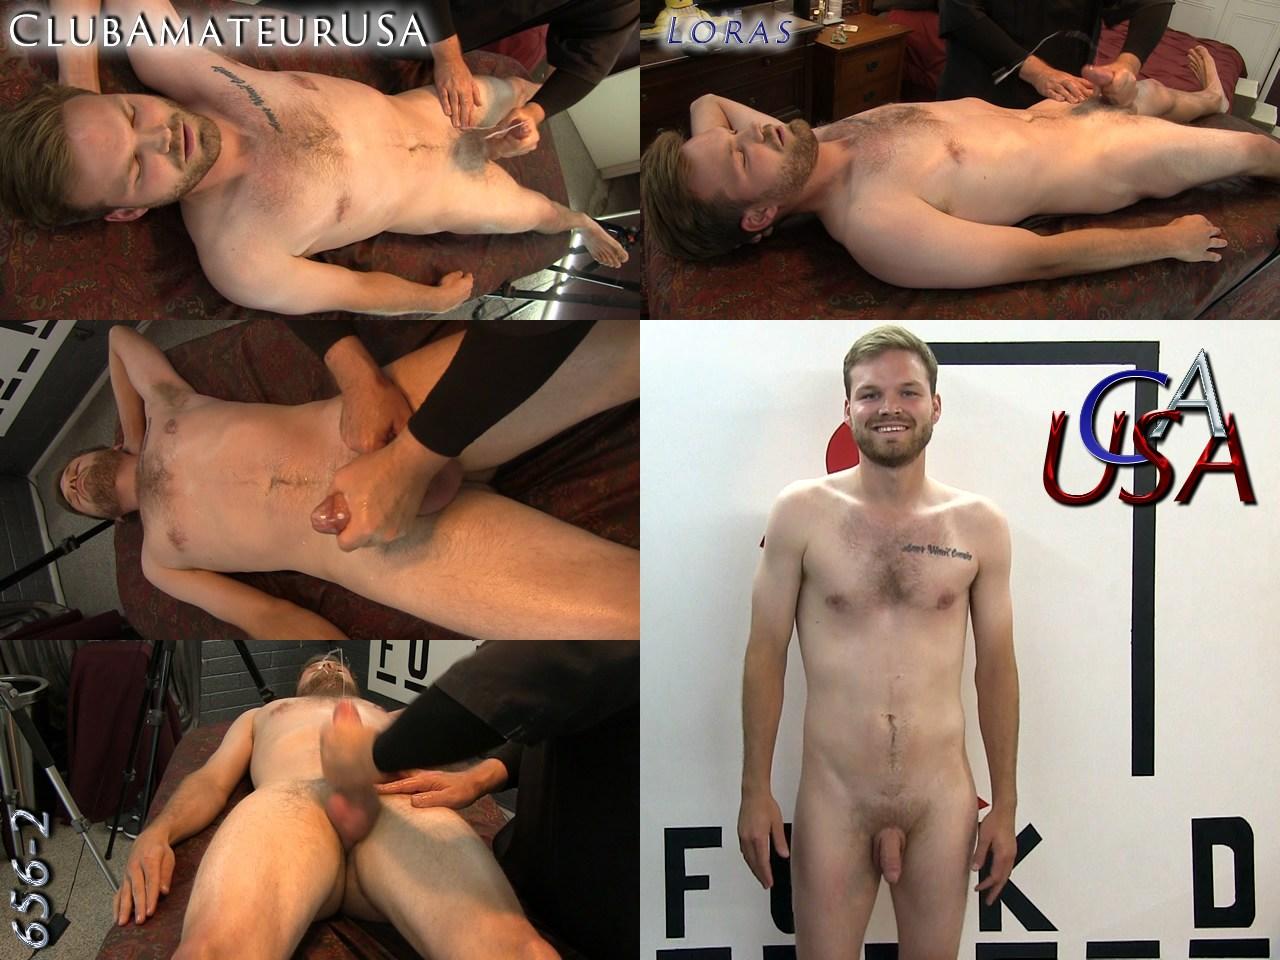 CAUSA 656 Loras - 2 of 2 - ClubAmateurUSA Lady mai nude gifs